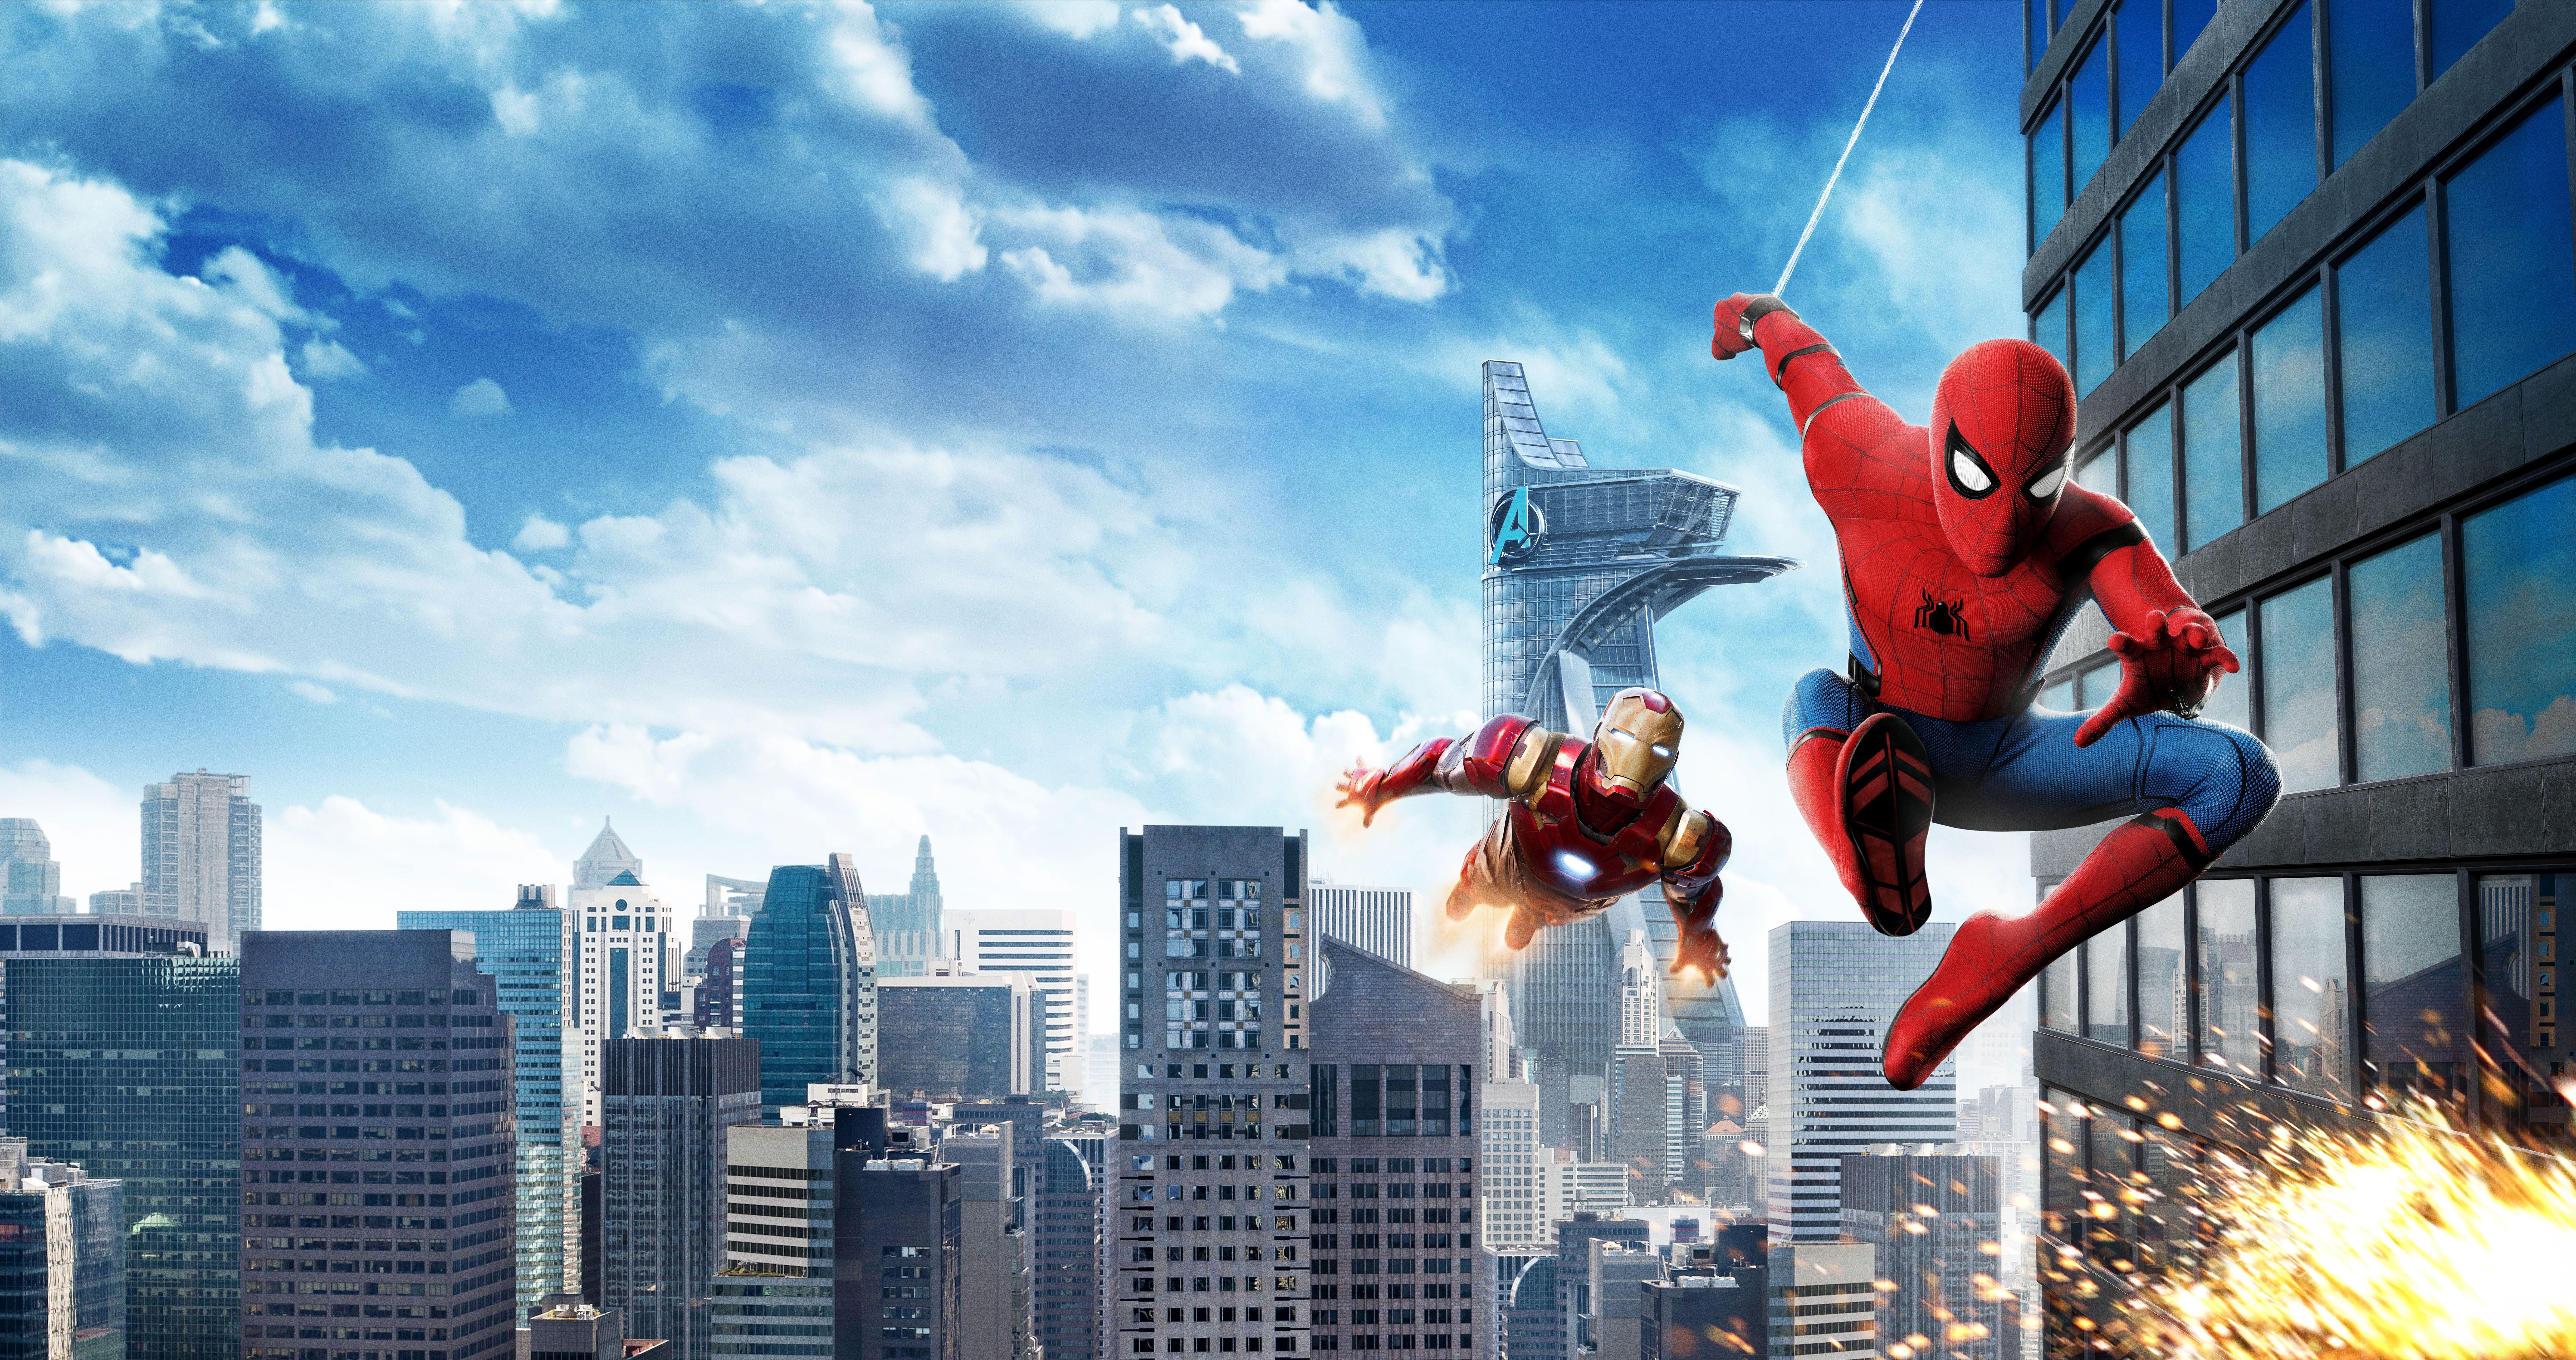 Iron Spider-Man Wallpapers - Top Free Iron Spider-Man